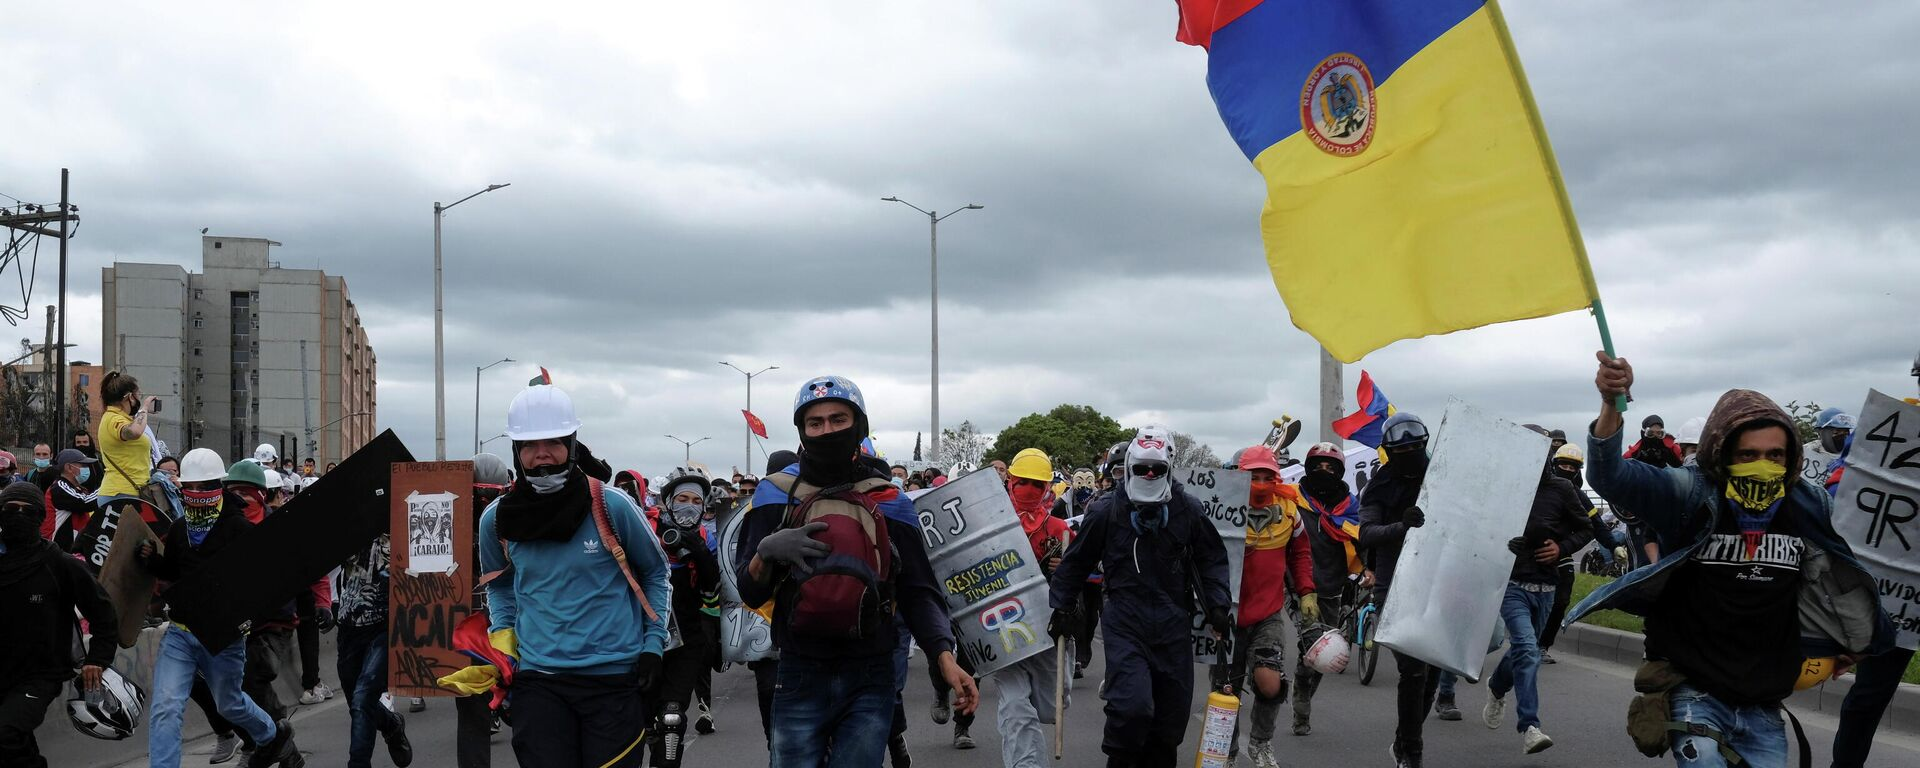 Protestas en Colombia - Sputnik Mundo, 1920, 03.08.2021